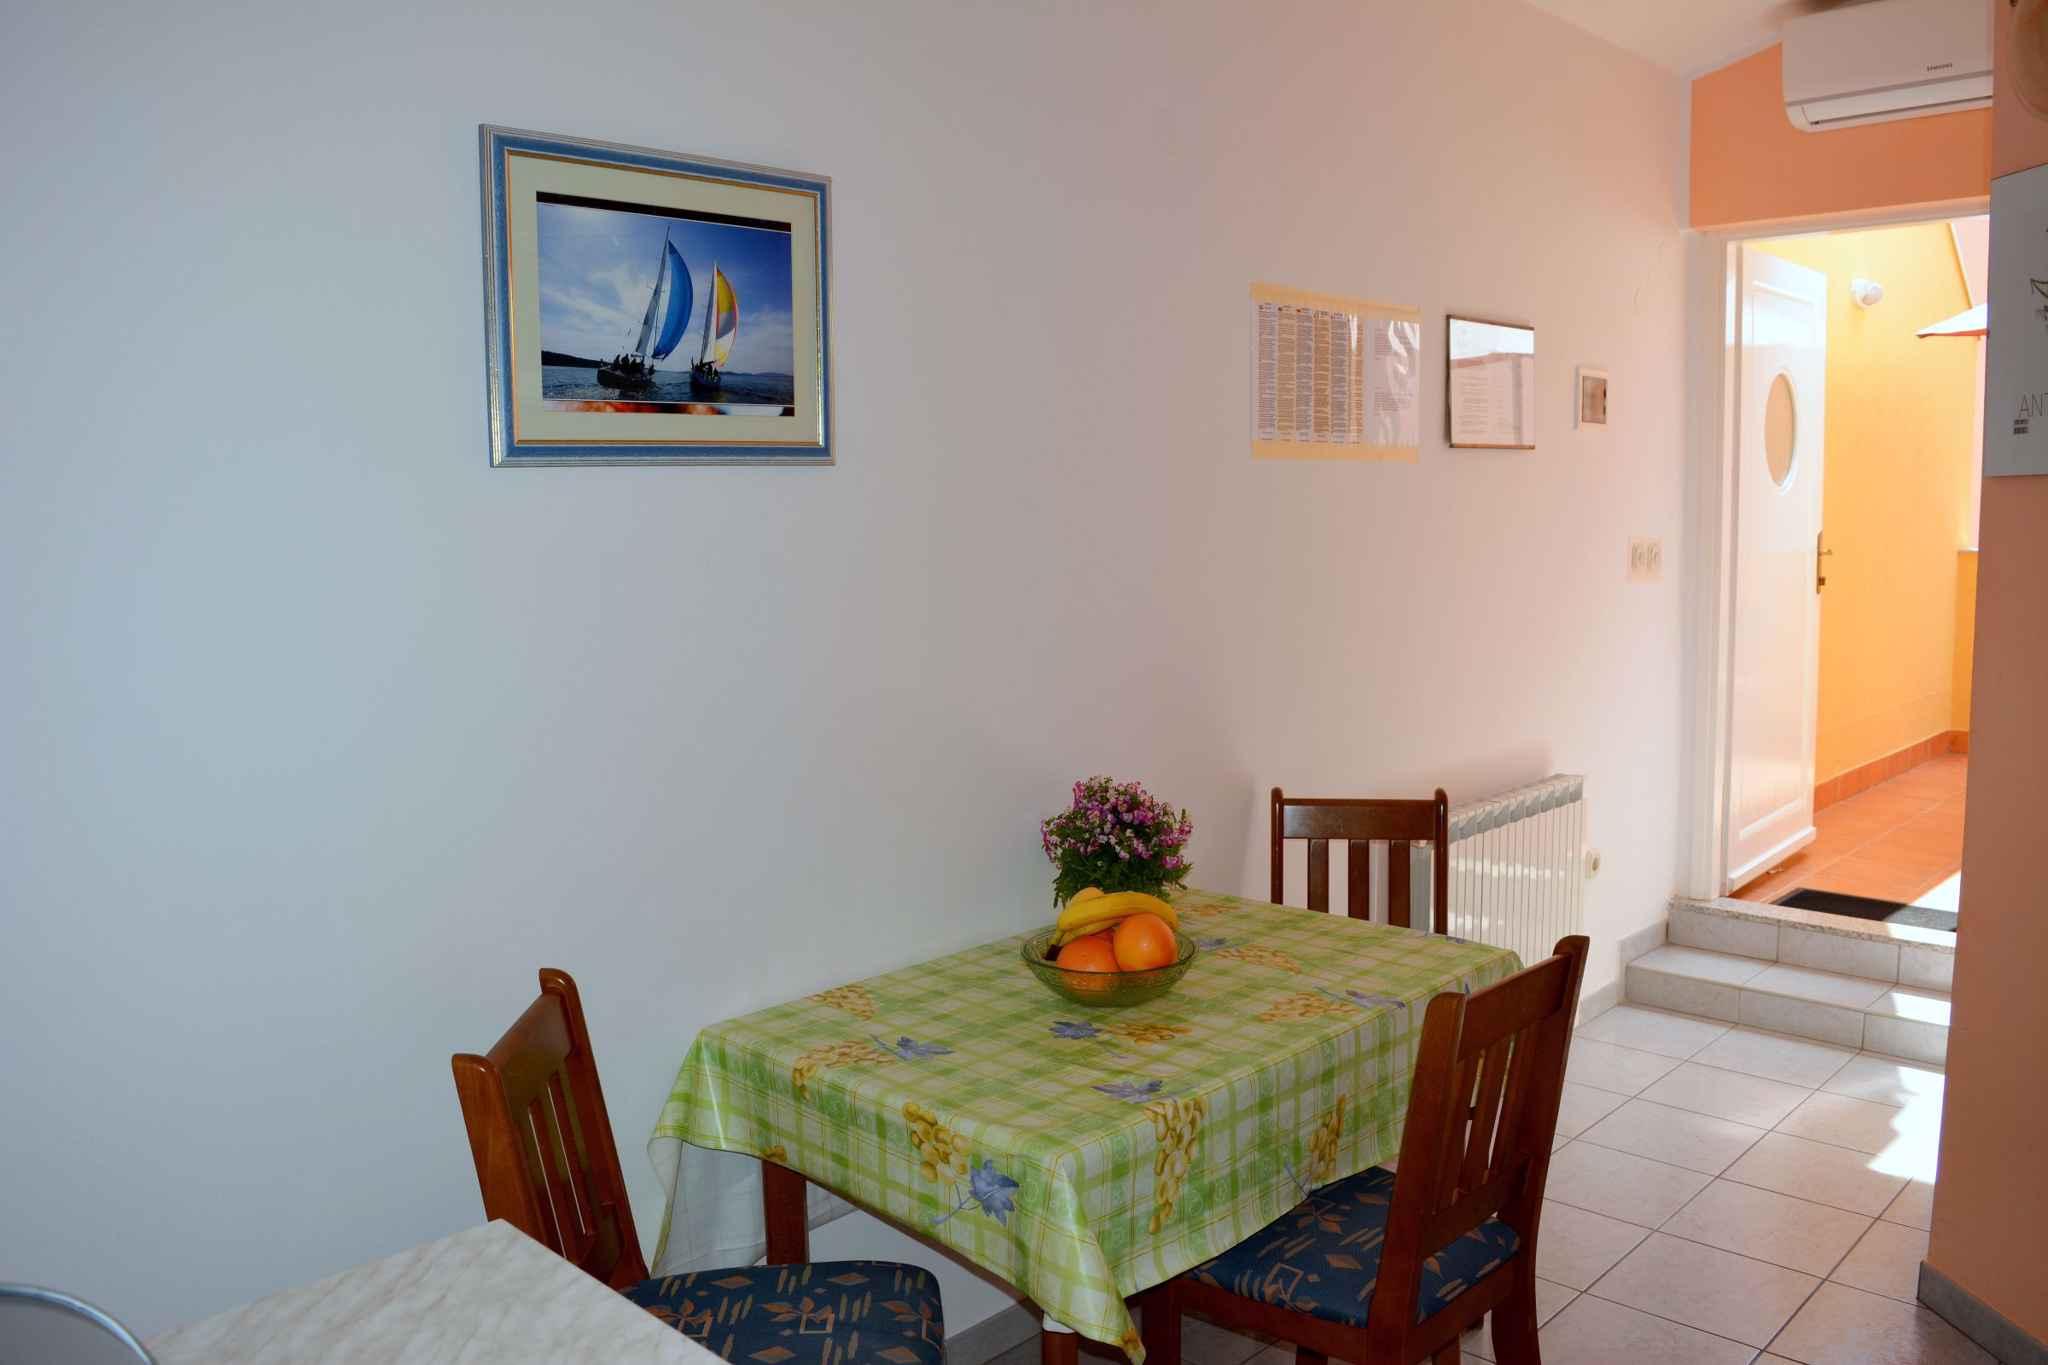 Appartement de vacances mit Terrasse (278775), Vodice, , Dalmatie, Croatie, image 6